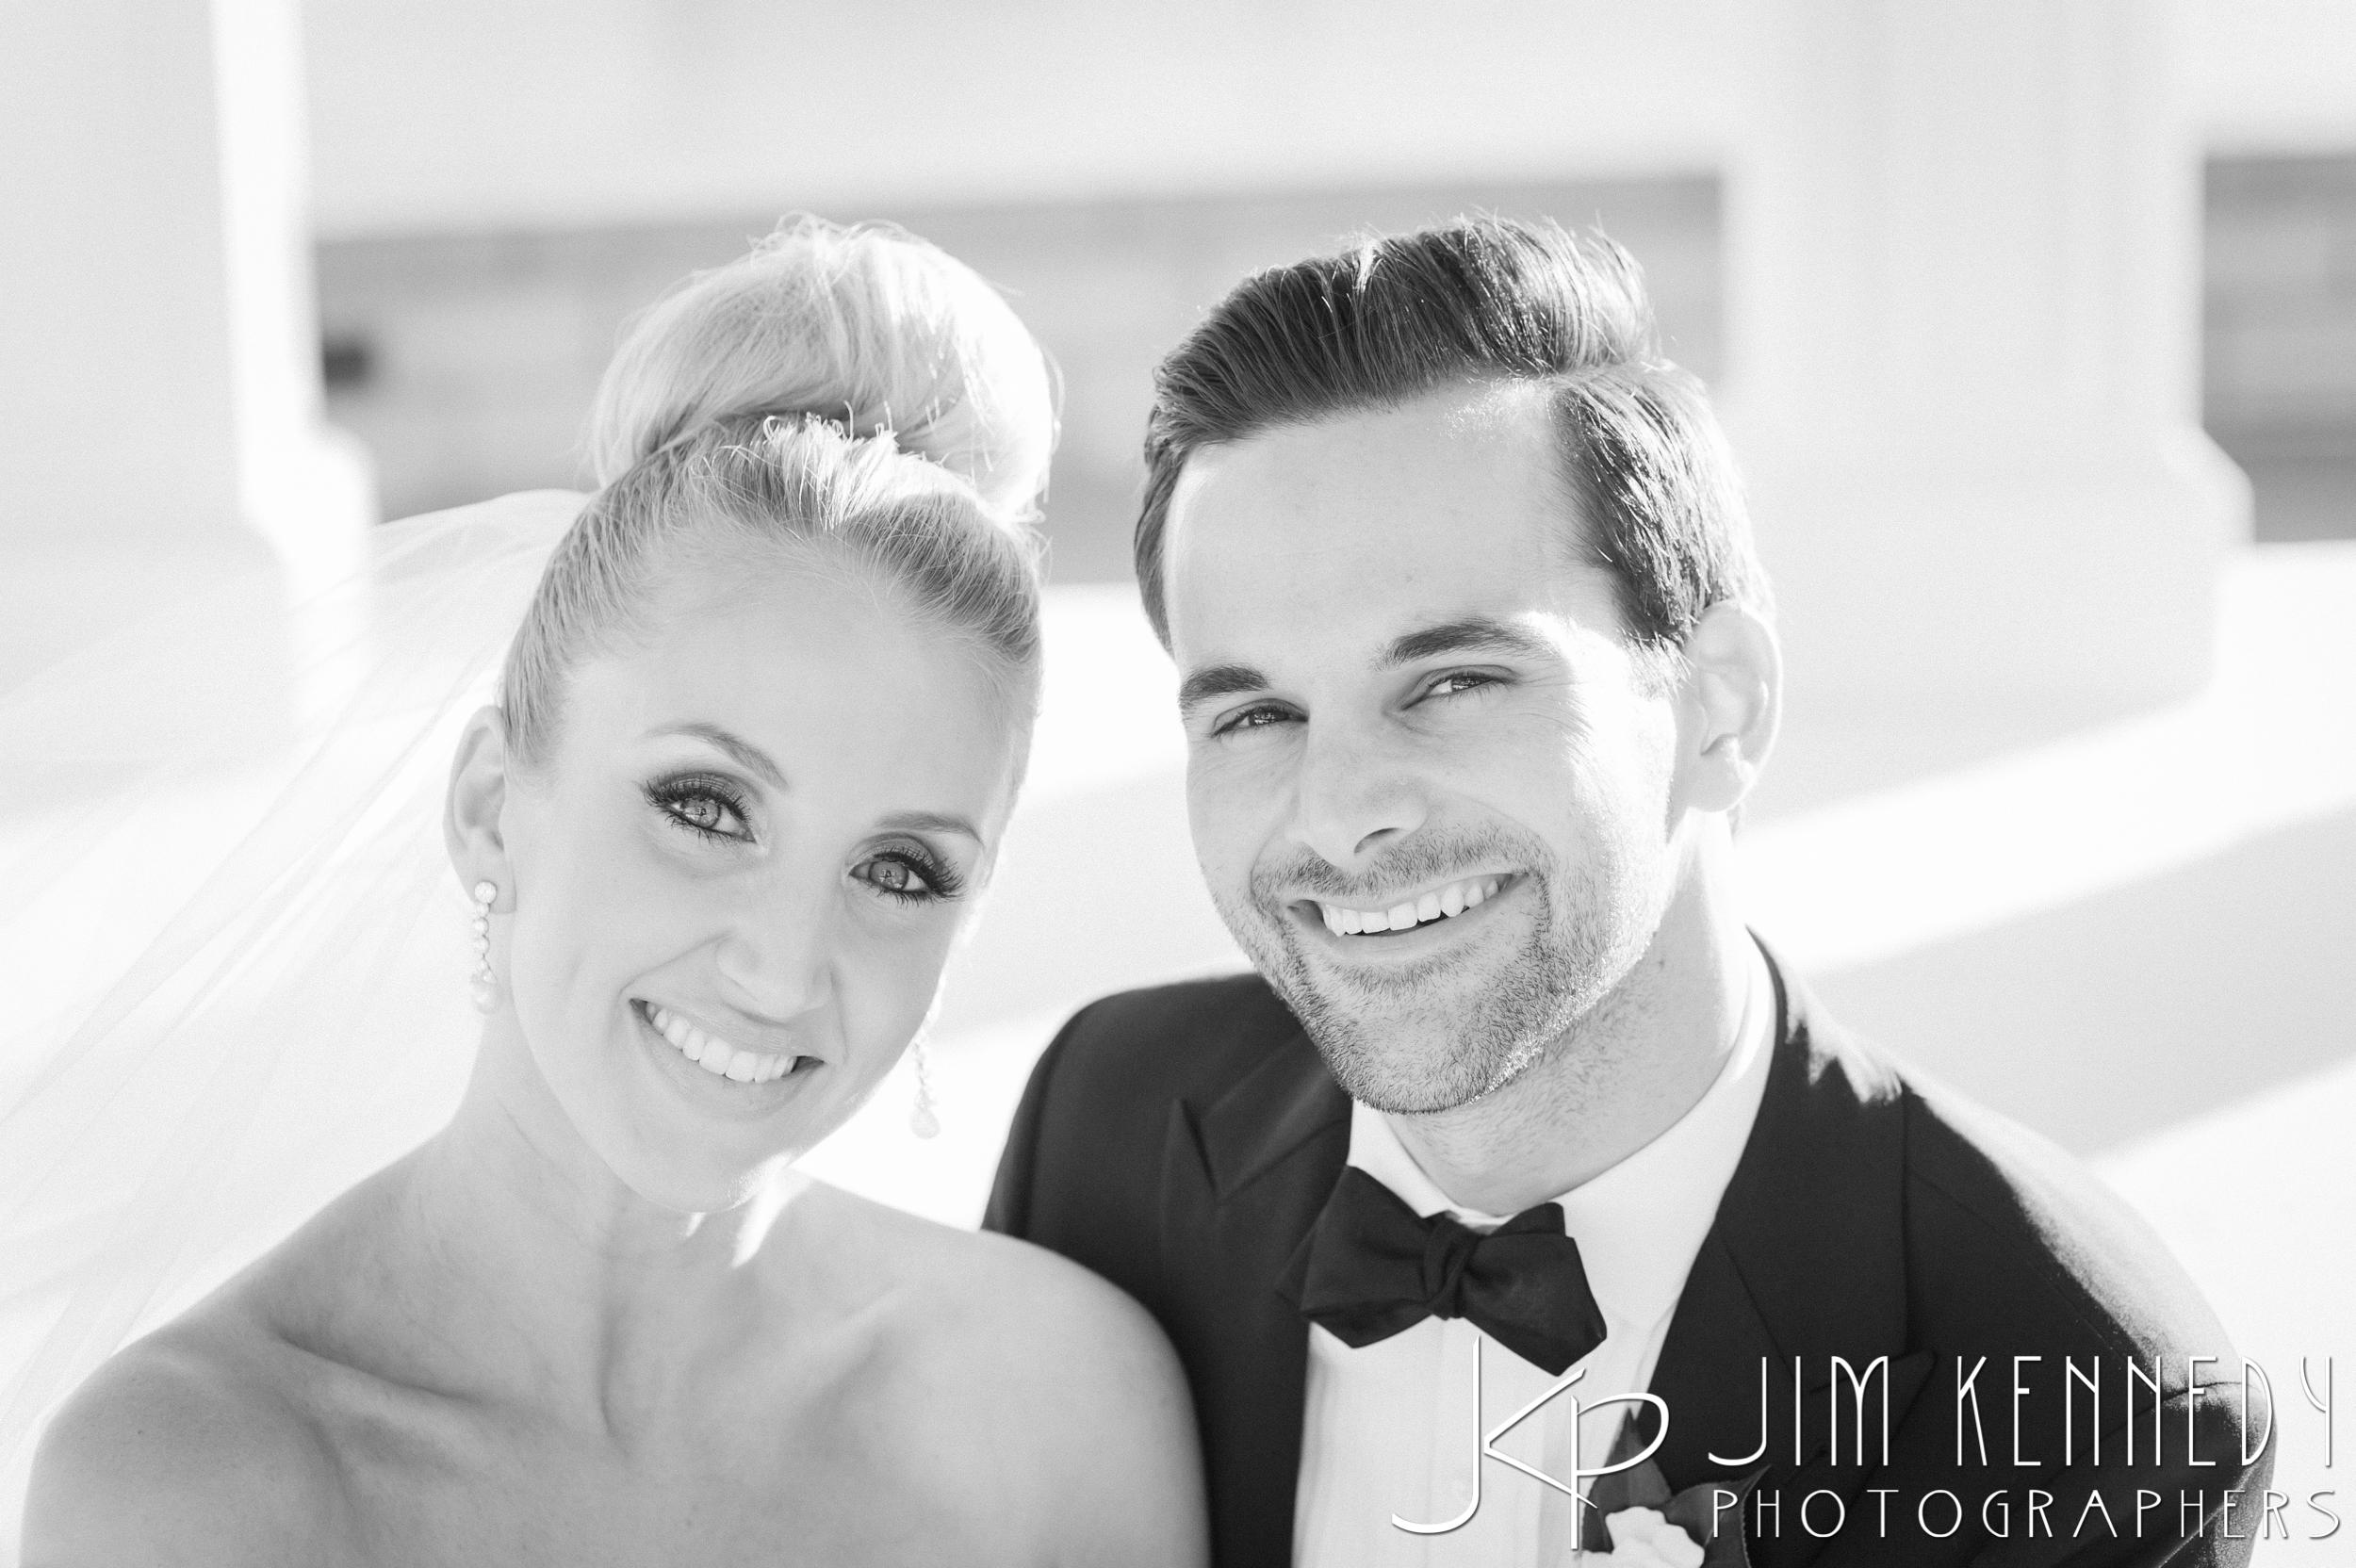 balboa-bay-resort-wedding-photography_0134.JPG